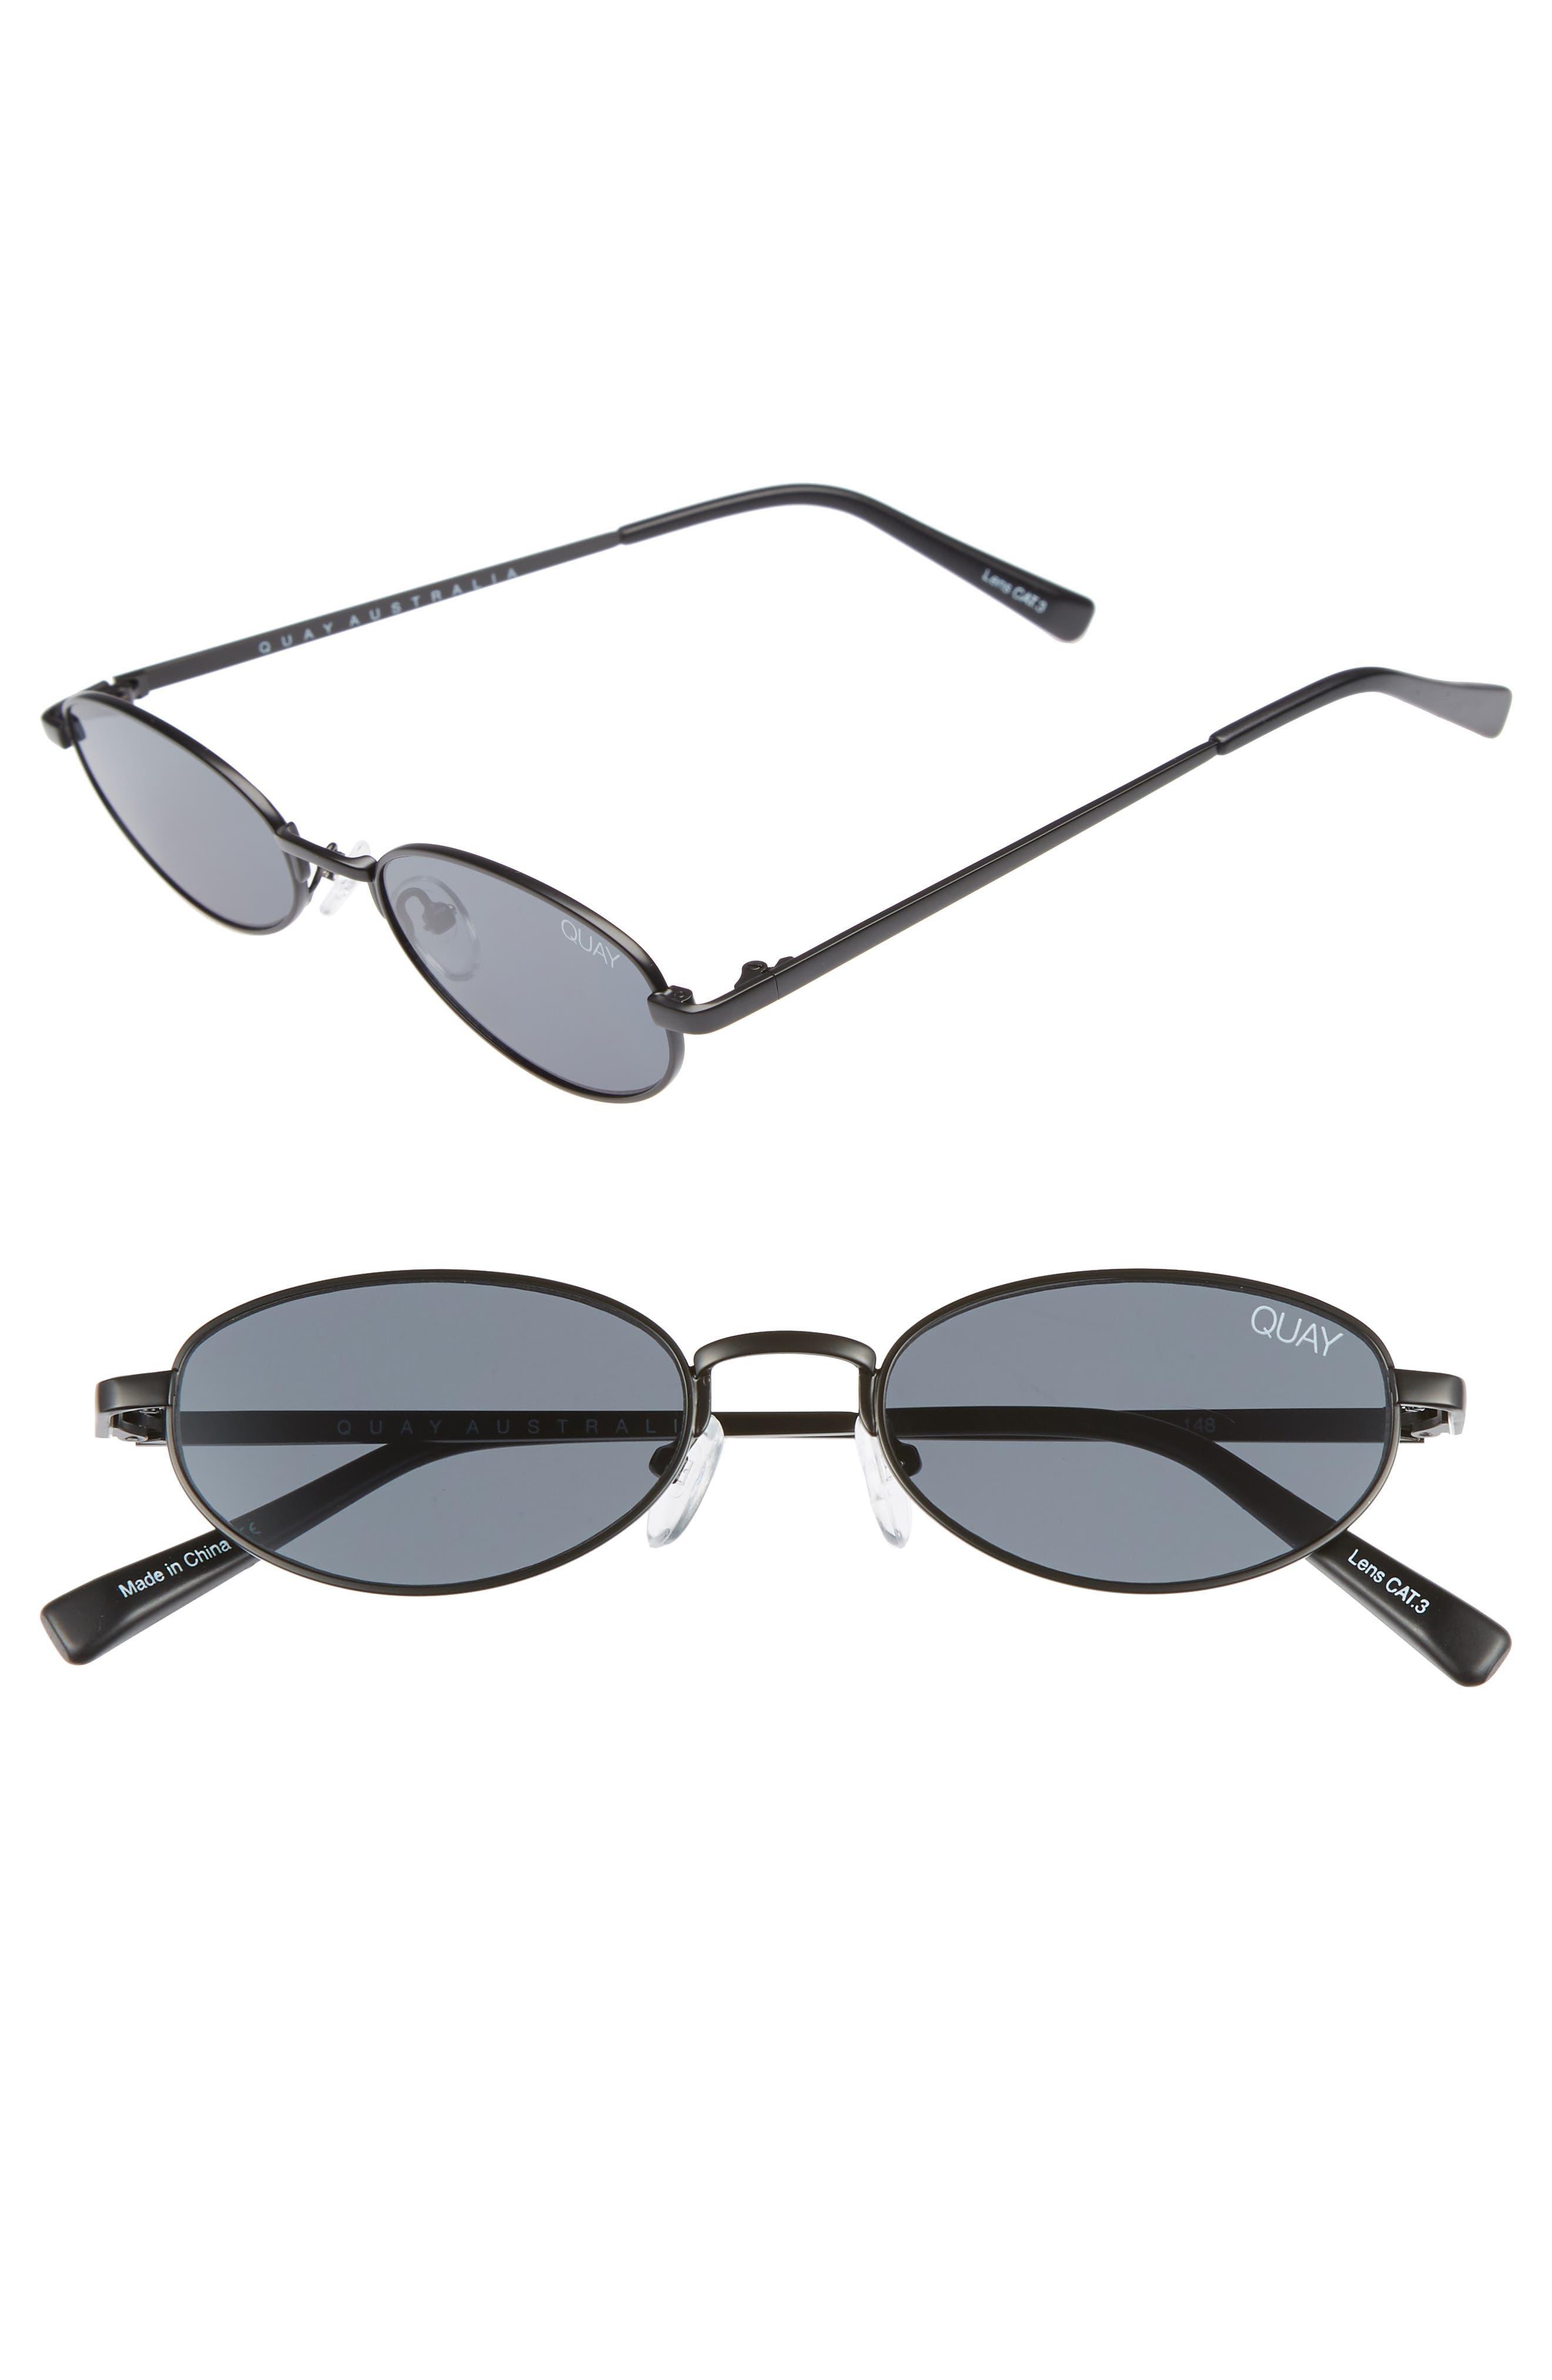 49mm Showdown Oval Sunglasses,                             Main thumbnail 1, color,                             BLACK/ SMOKE